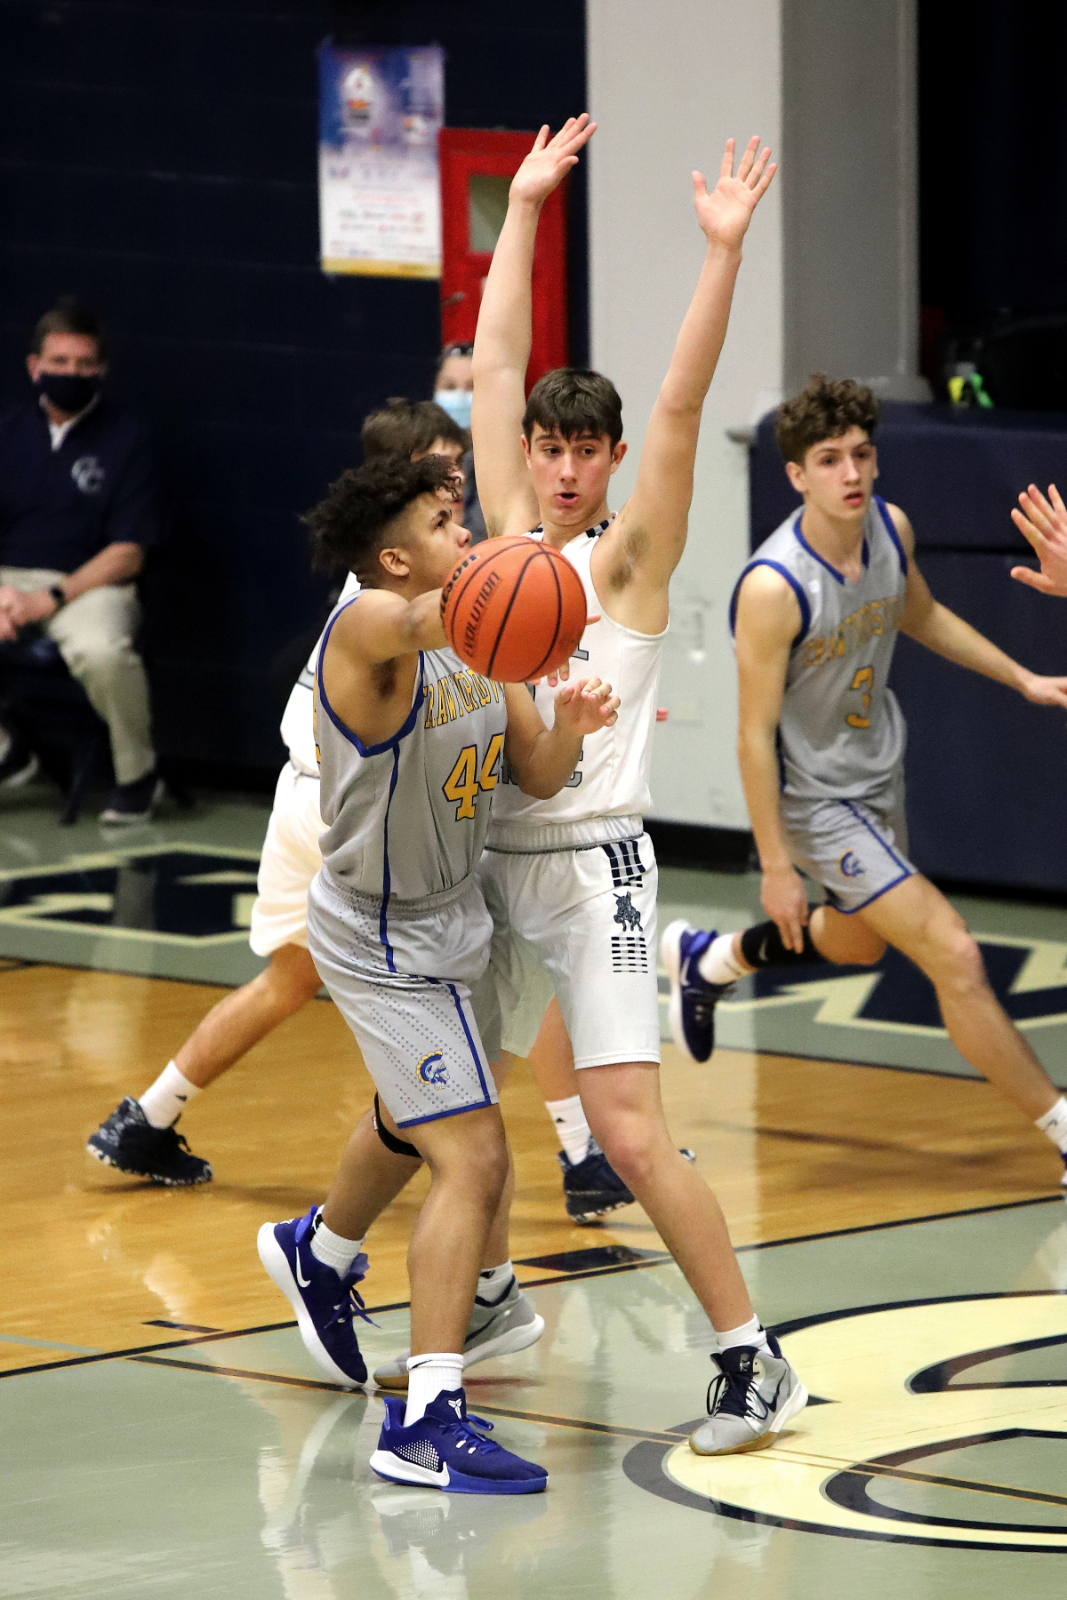 CC Varsity Boys Basketball vs Crawfordsville 2-20-21